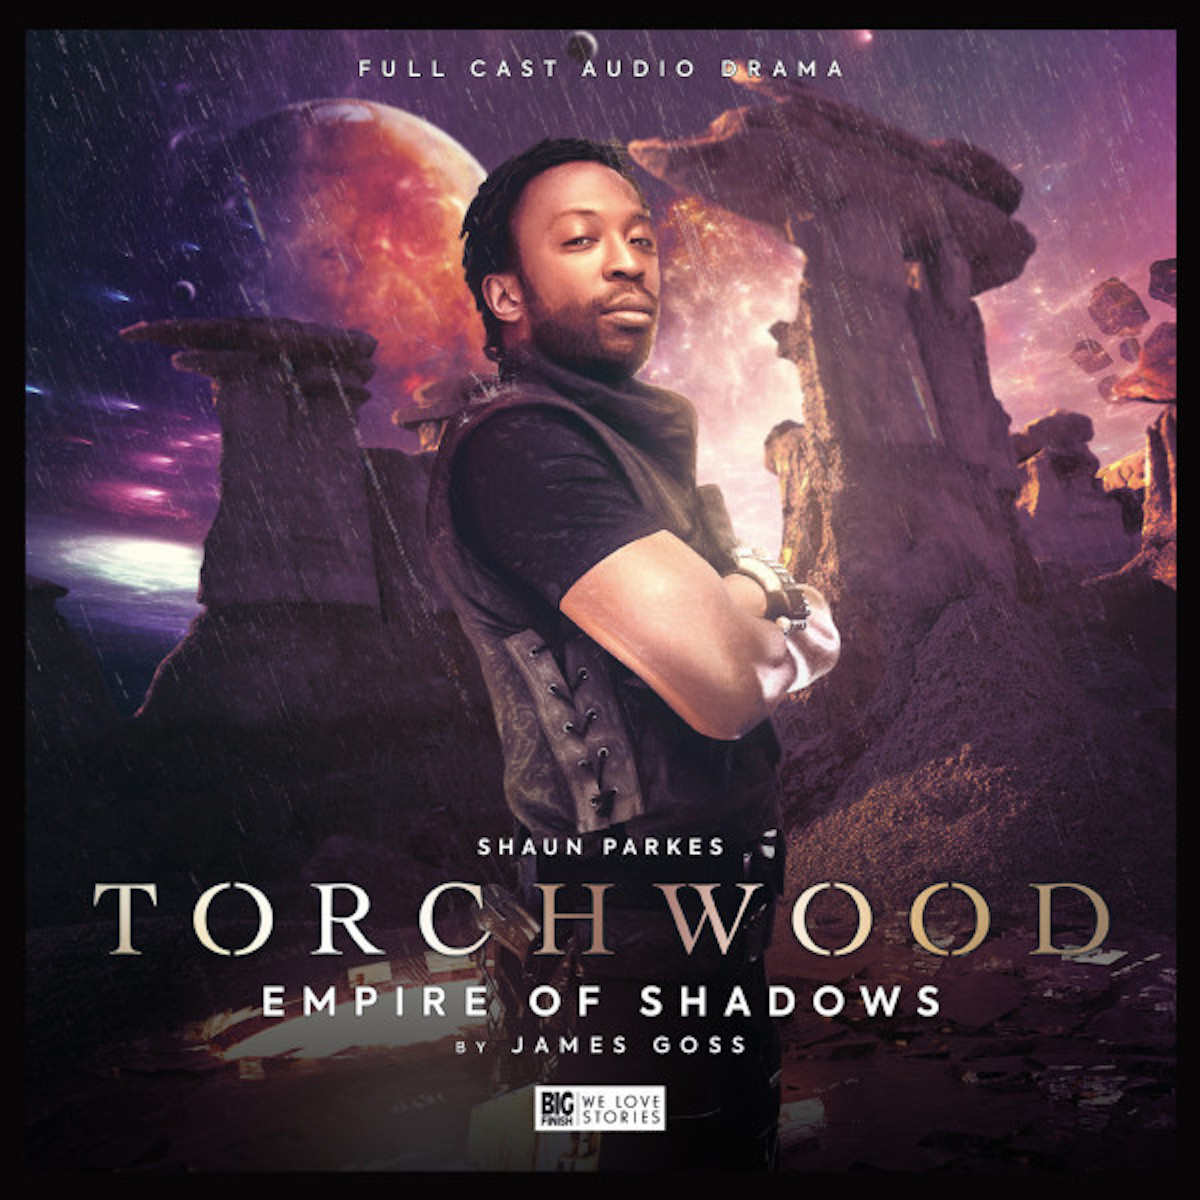 Torchwood: Empire of Shadows